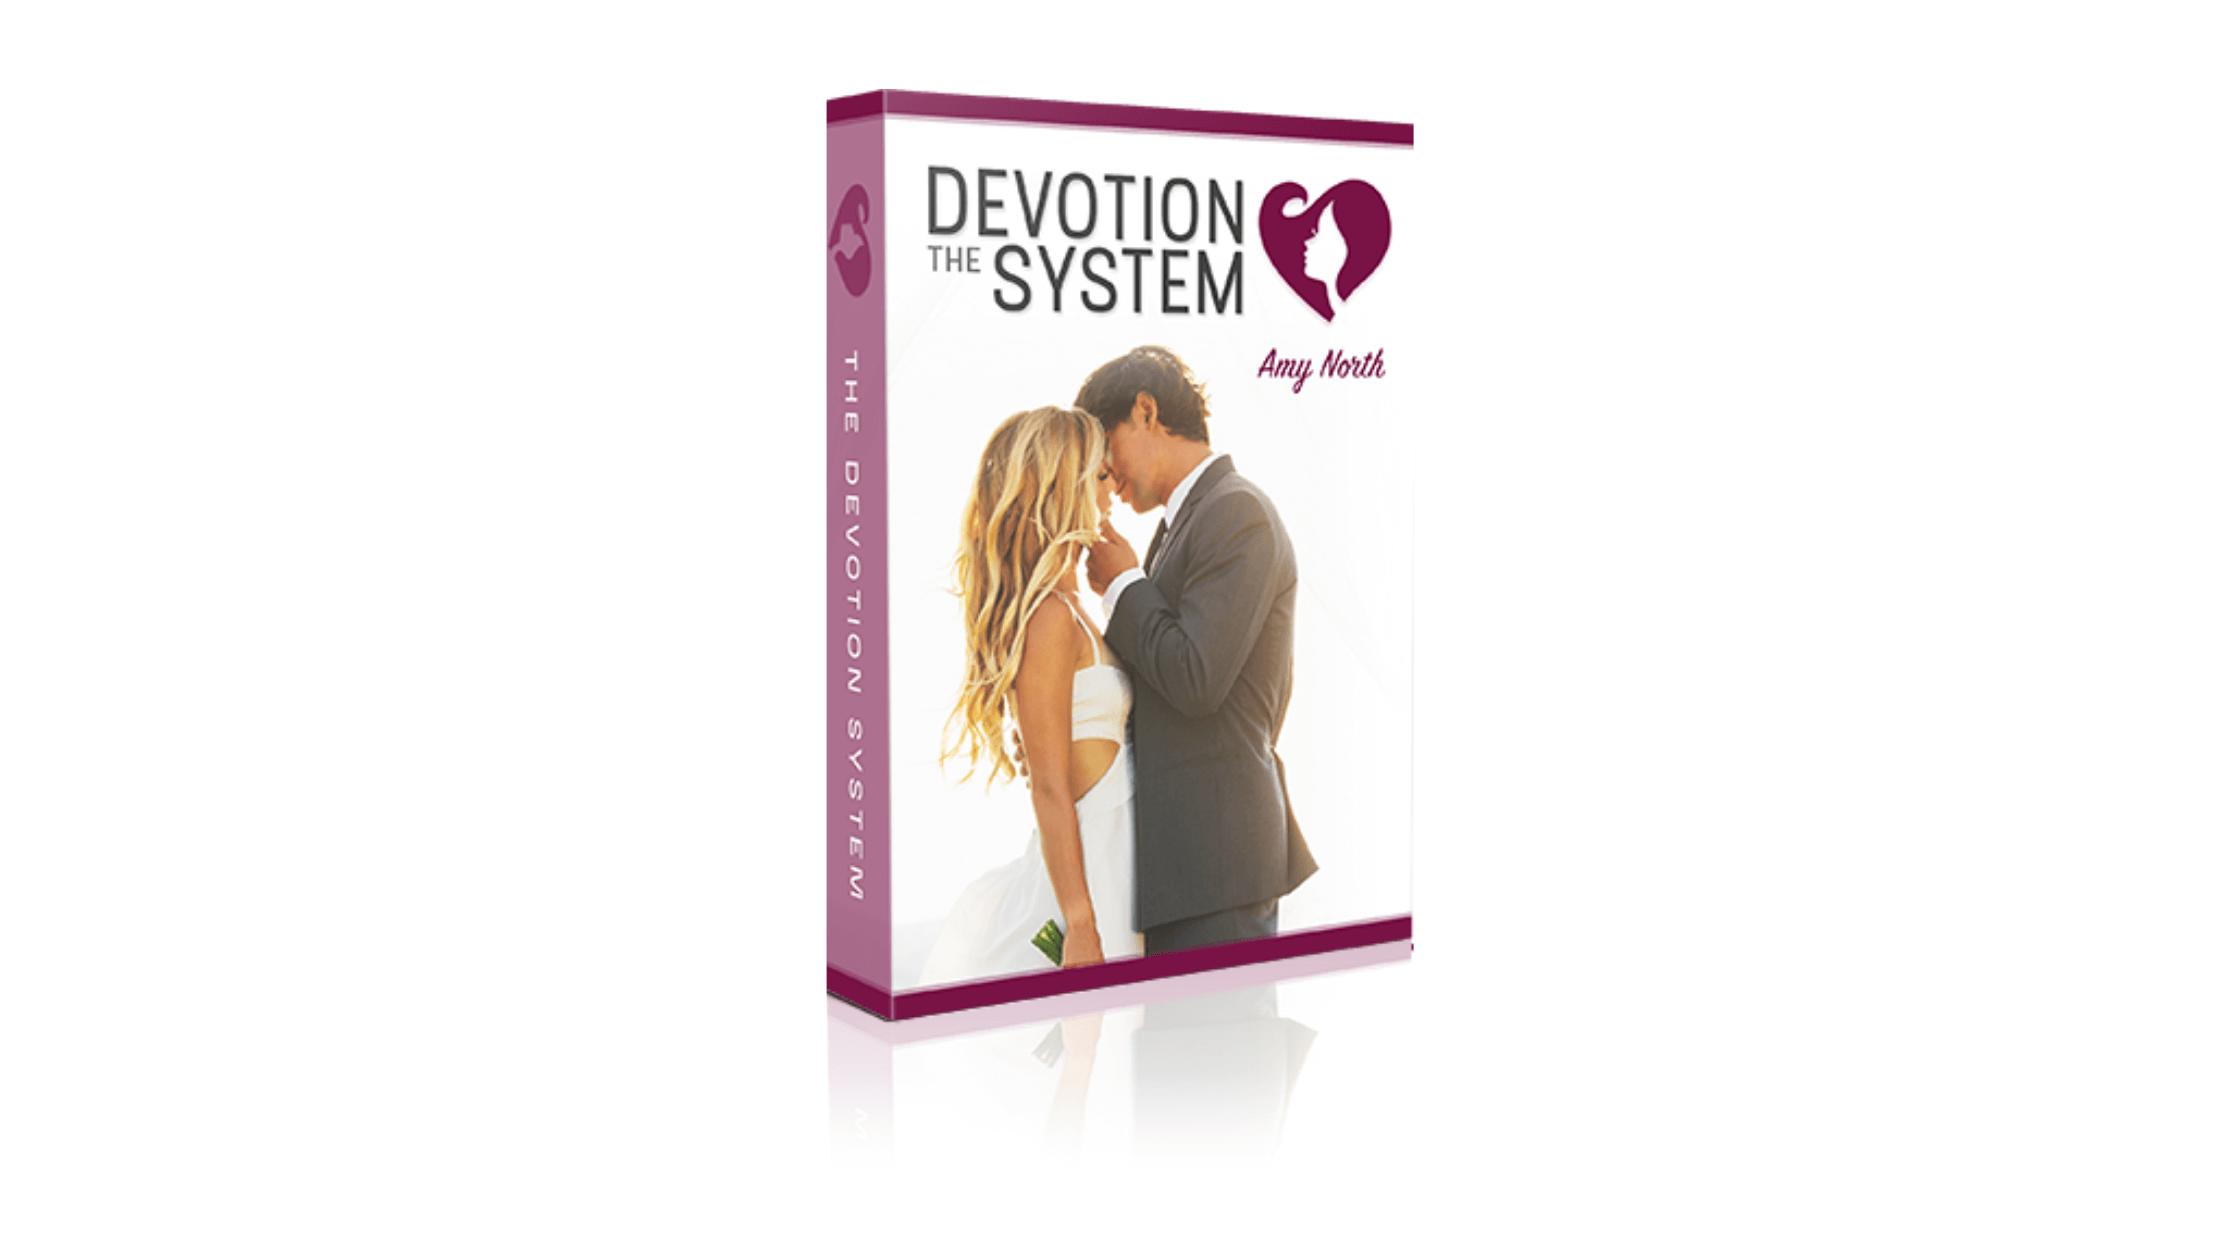 The Devotion System Reviews